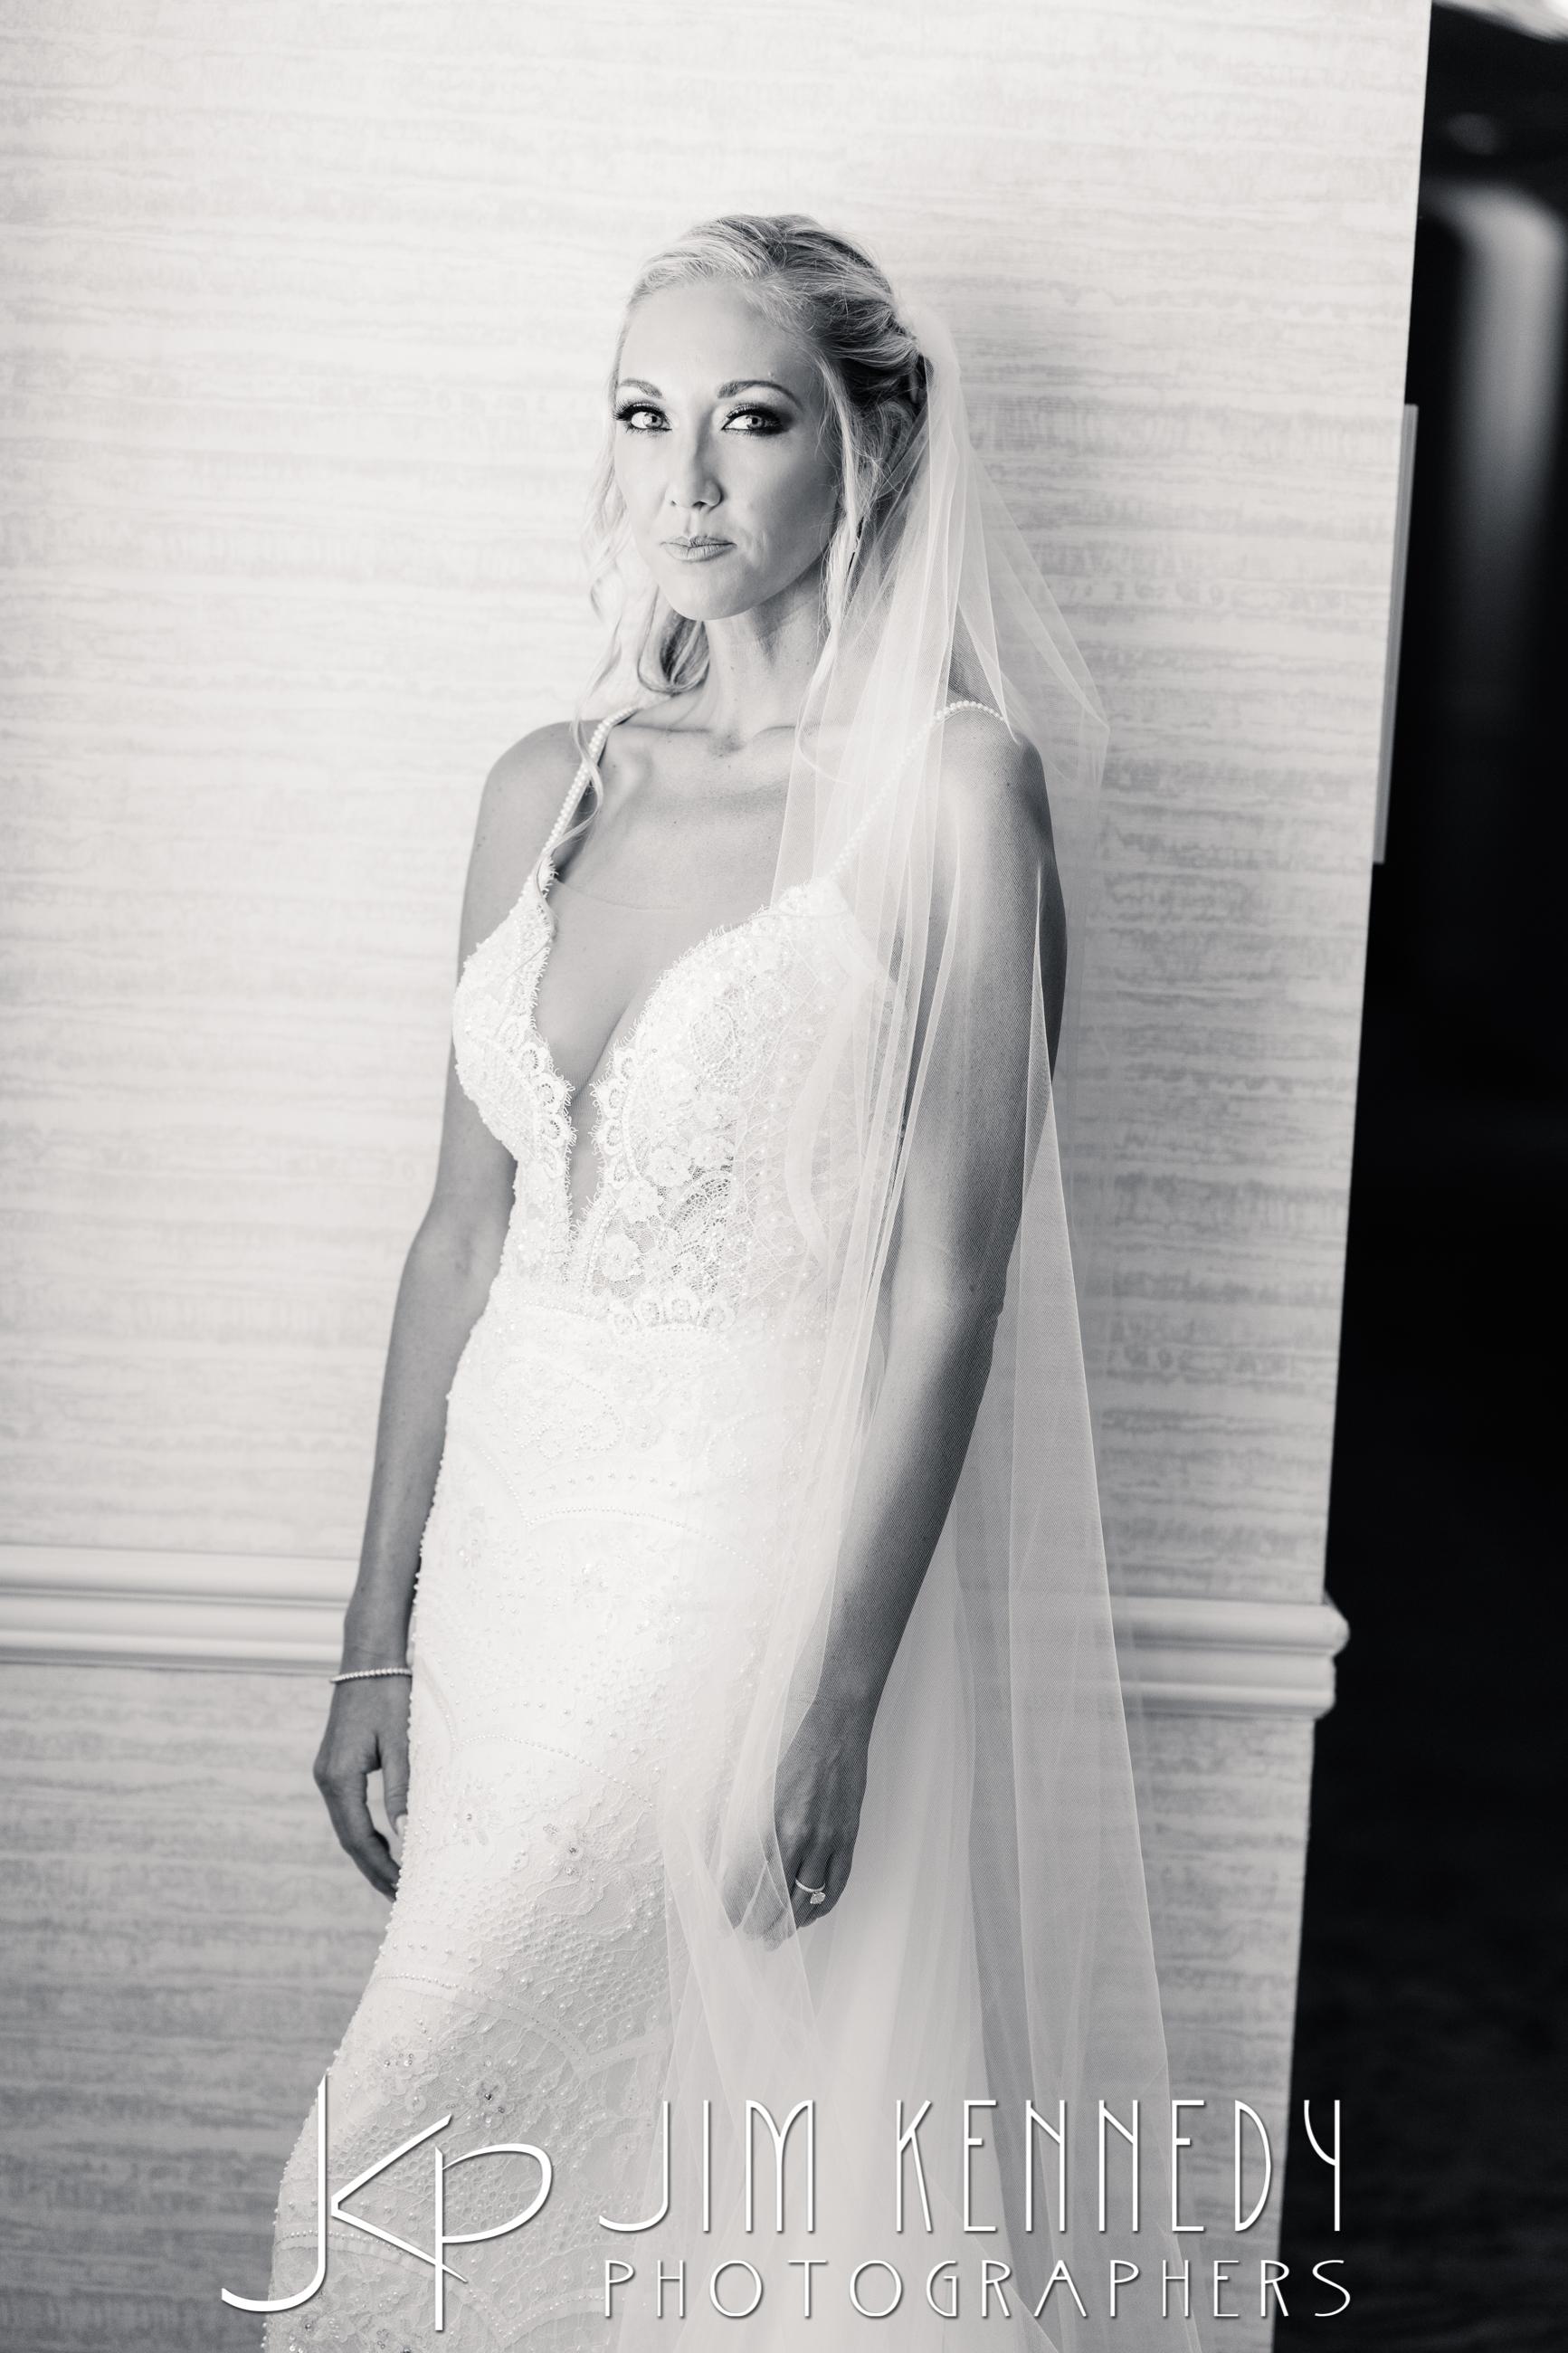 balboa-bay-resort-wedding-brooke-kevin_0048.JPG